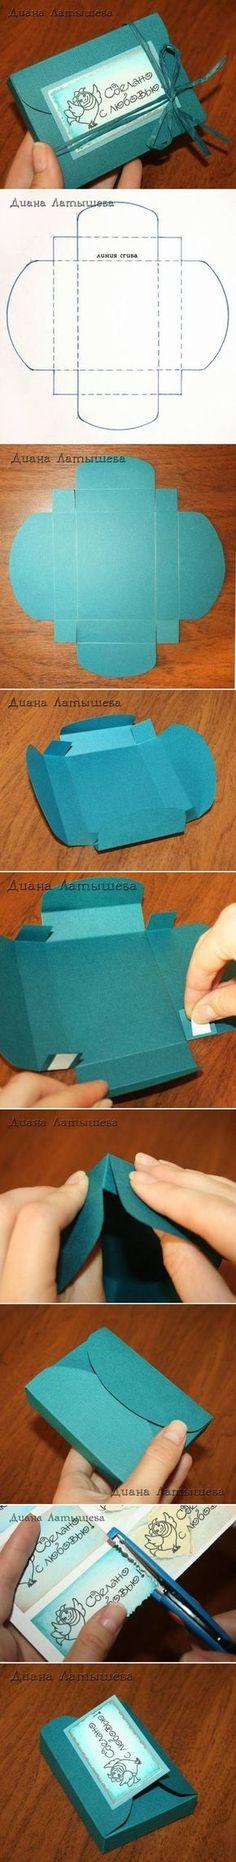 DIY Fancy Gift Box DIY Projects / UsefulDIY.com